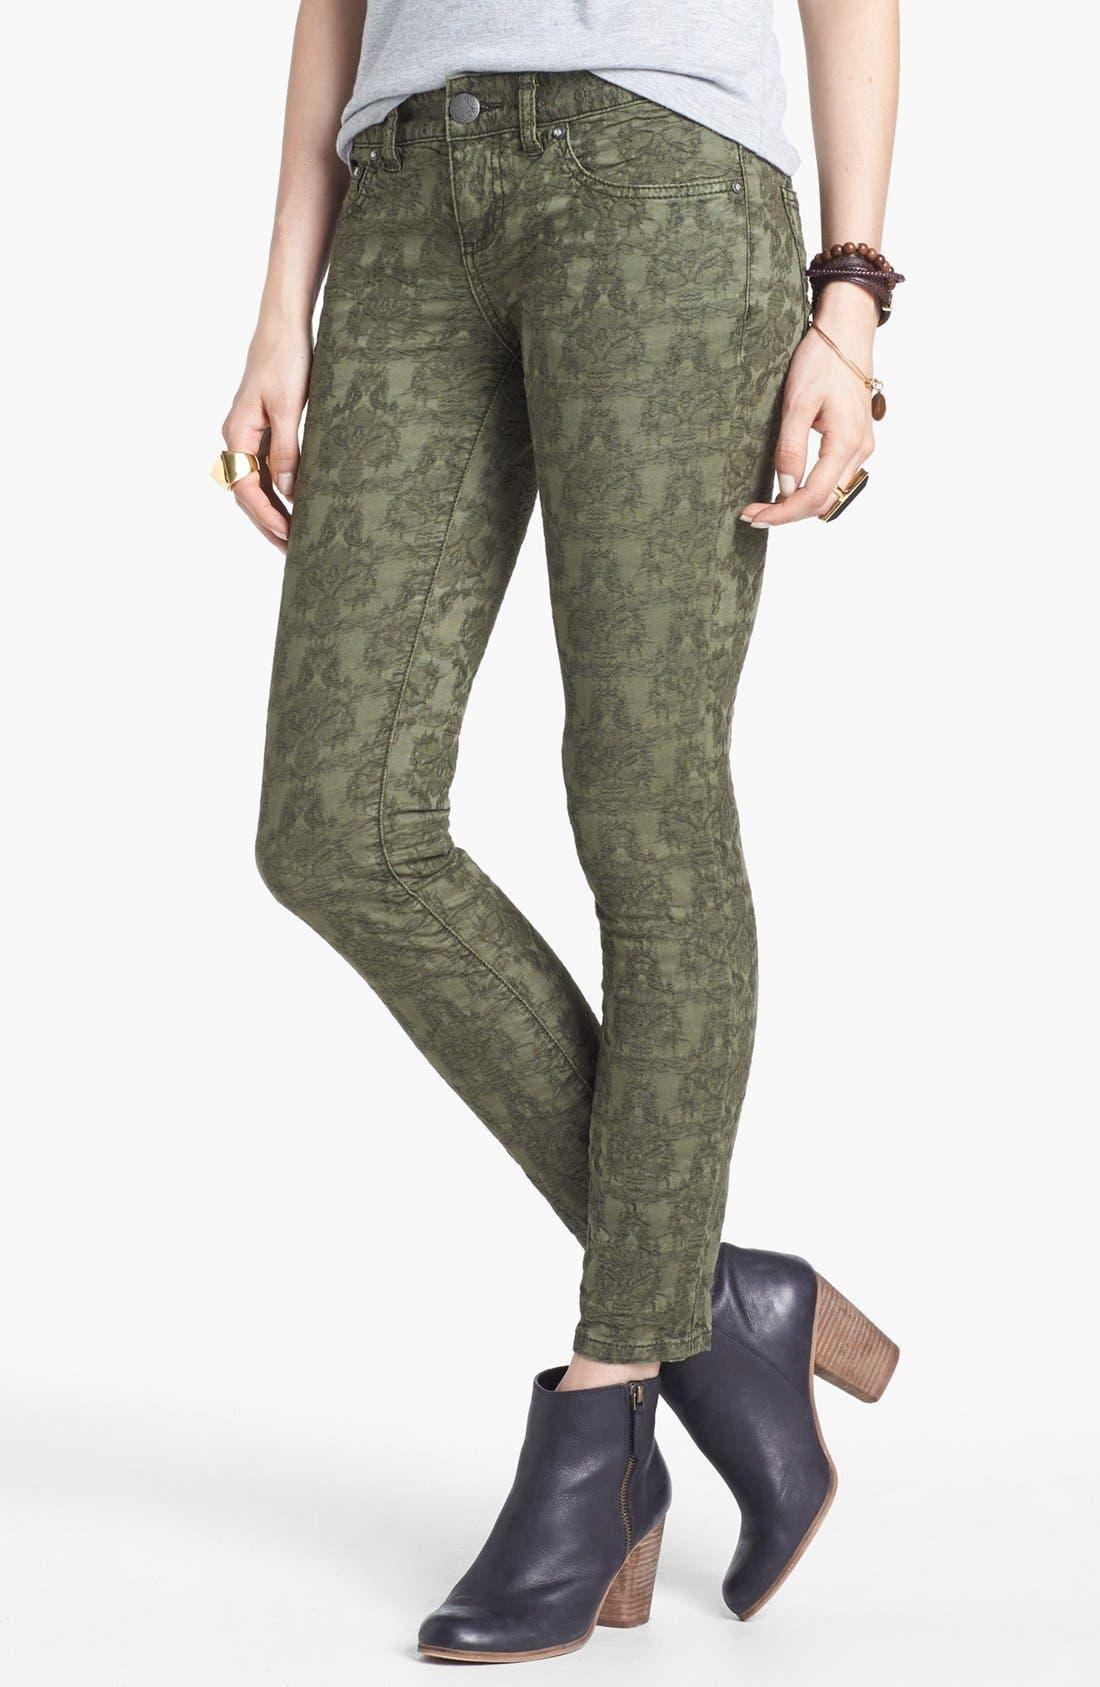 Alternate Image 1 Selected - Free People Jacquard Skinny Jeans (Olive)